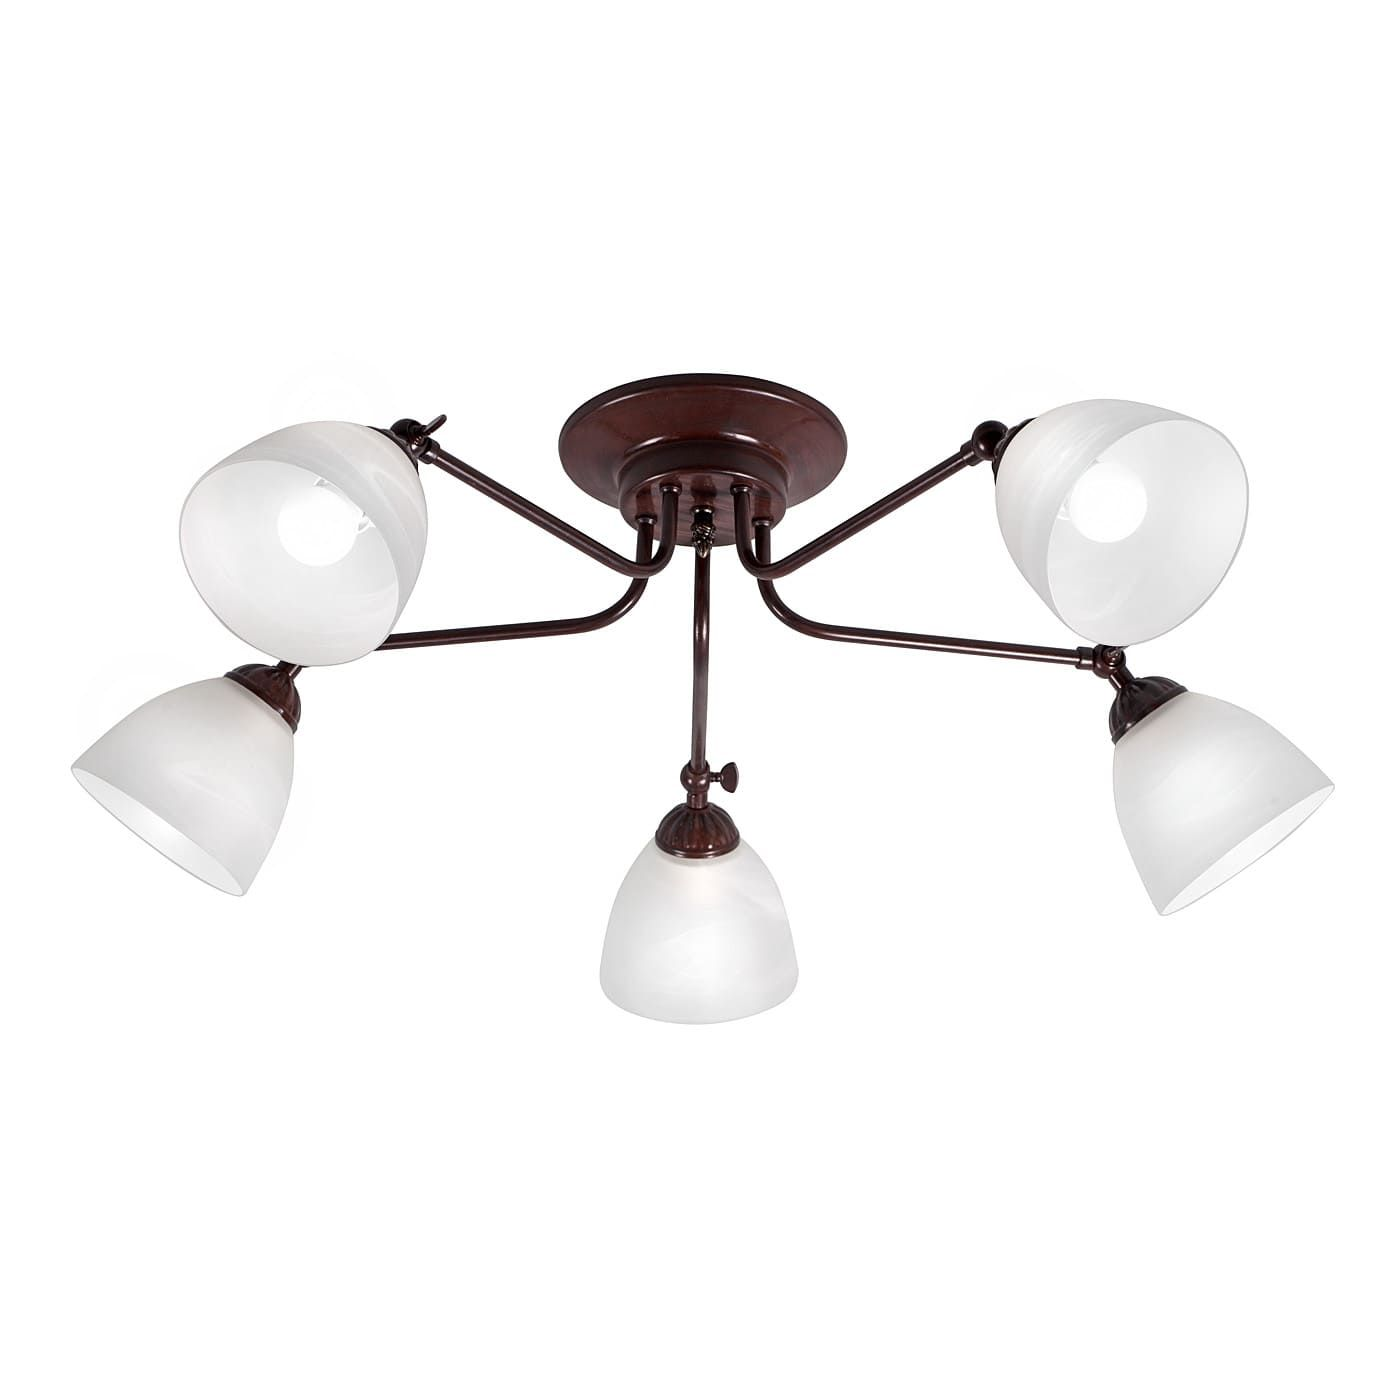 PETRASVET / Ceiling chandelier S2197-5, 5xE27 max. 60W